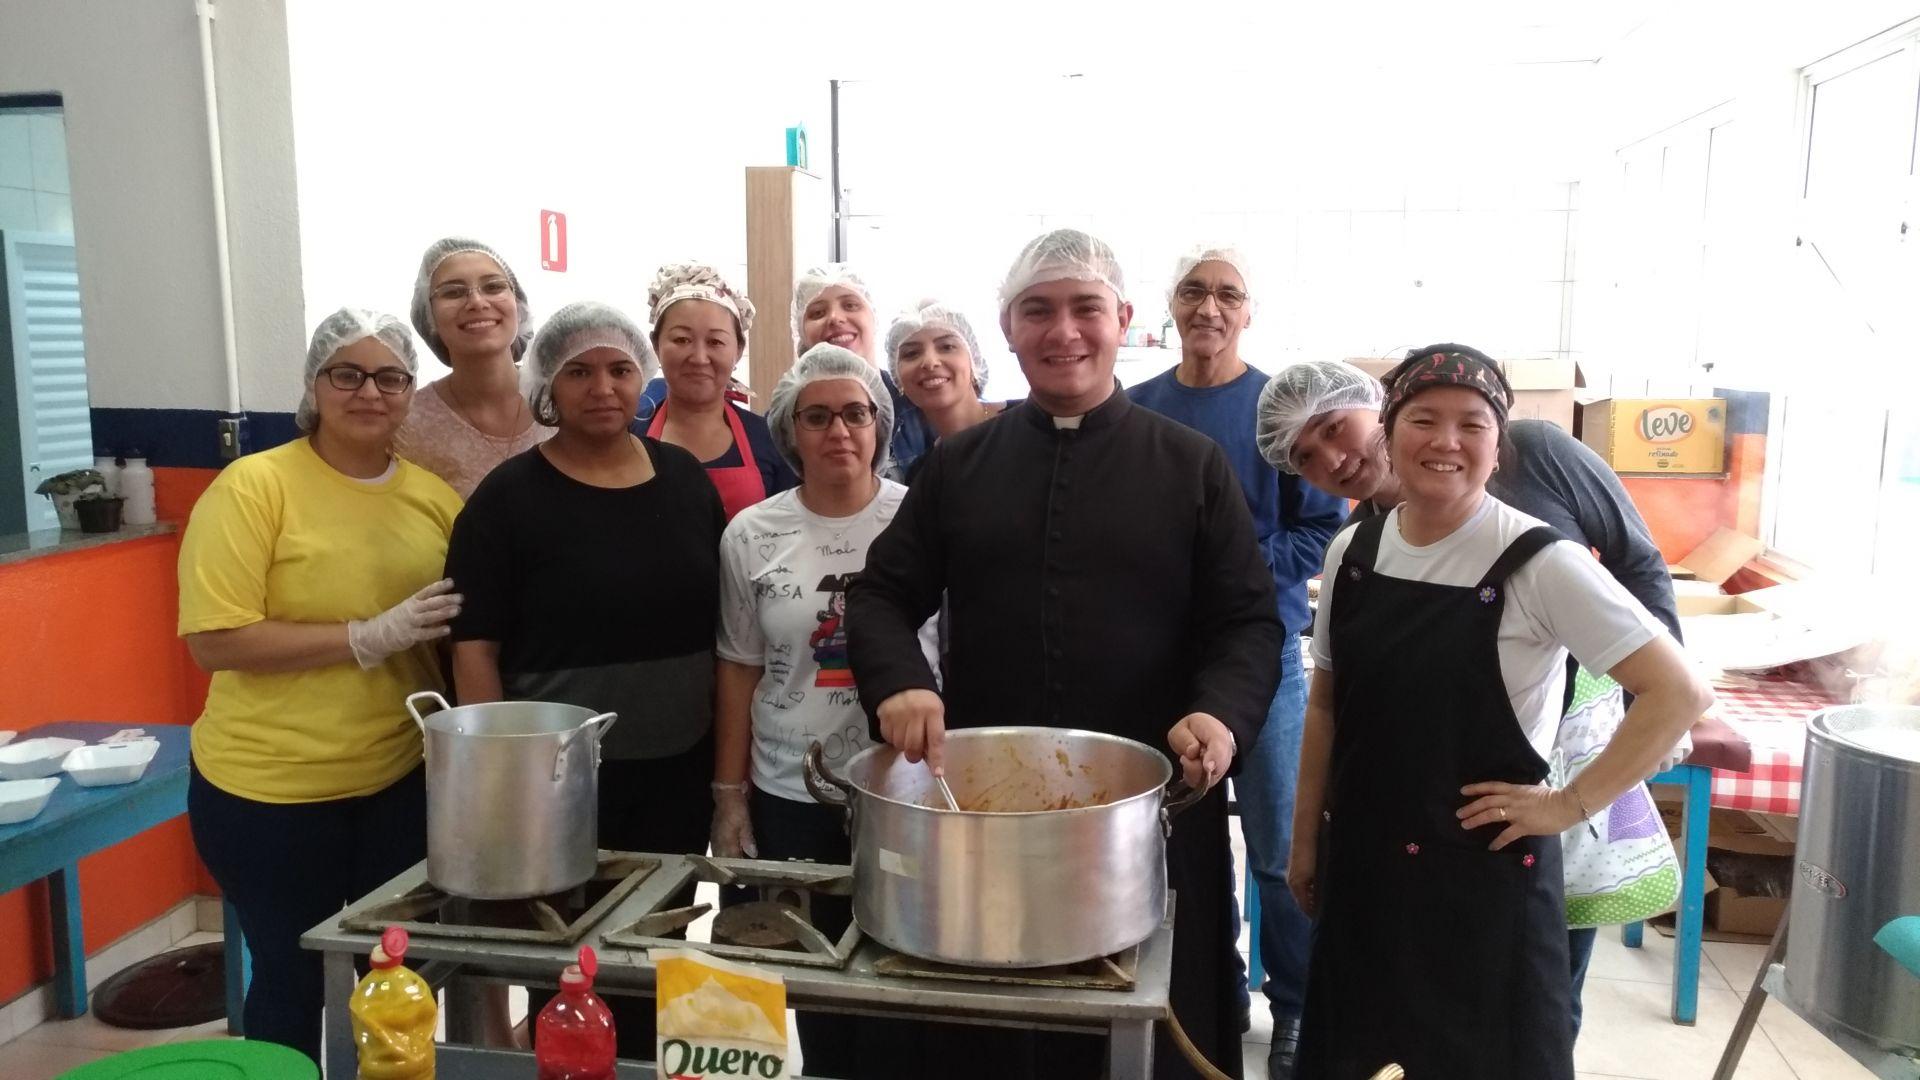 Equipe de Colaboradores do Colégio Diocesano Paulo VI  e Pais de alunos